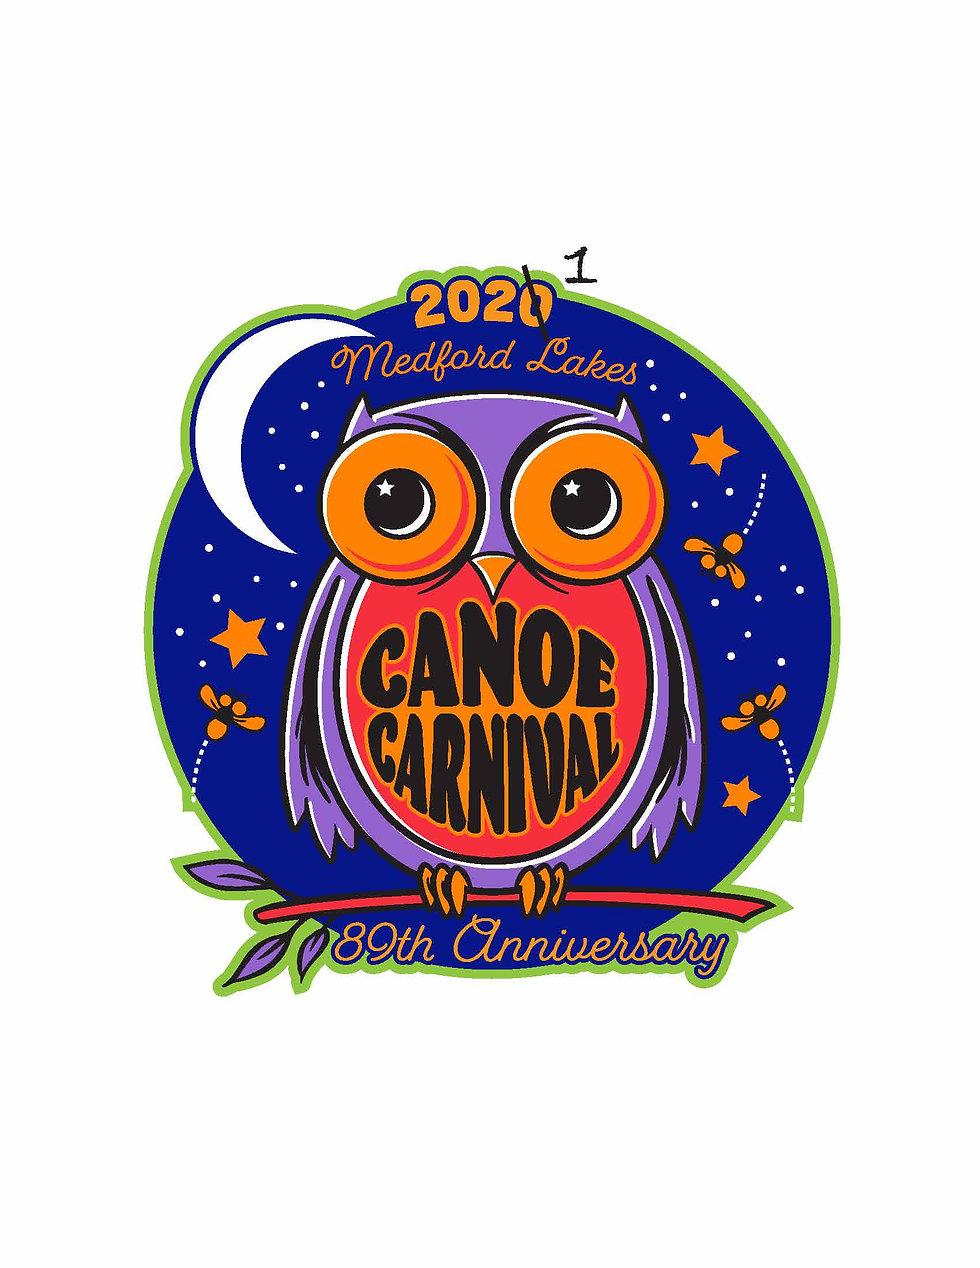 2021 CANOE CARNIVAL LOGO.jpg